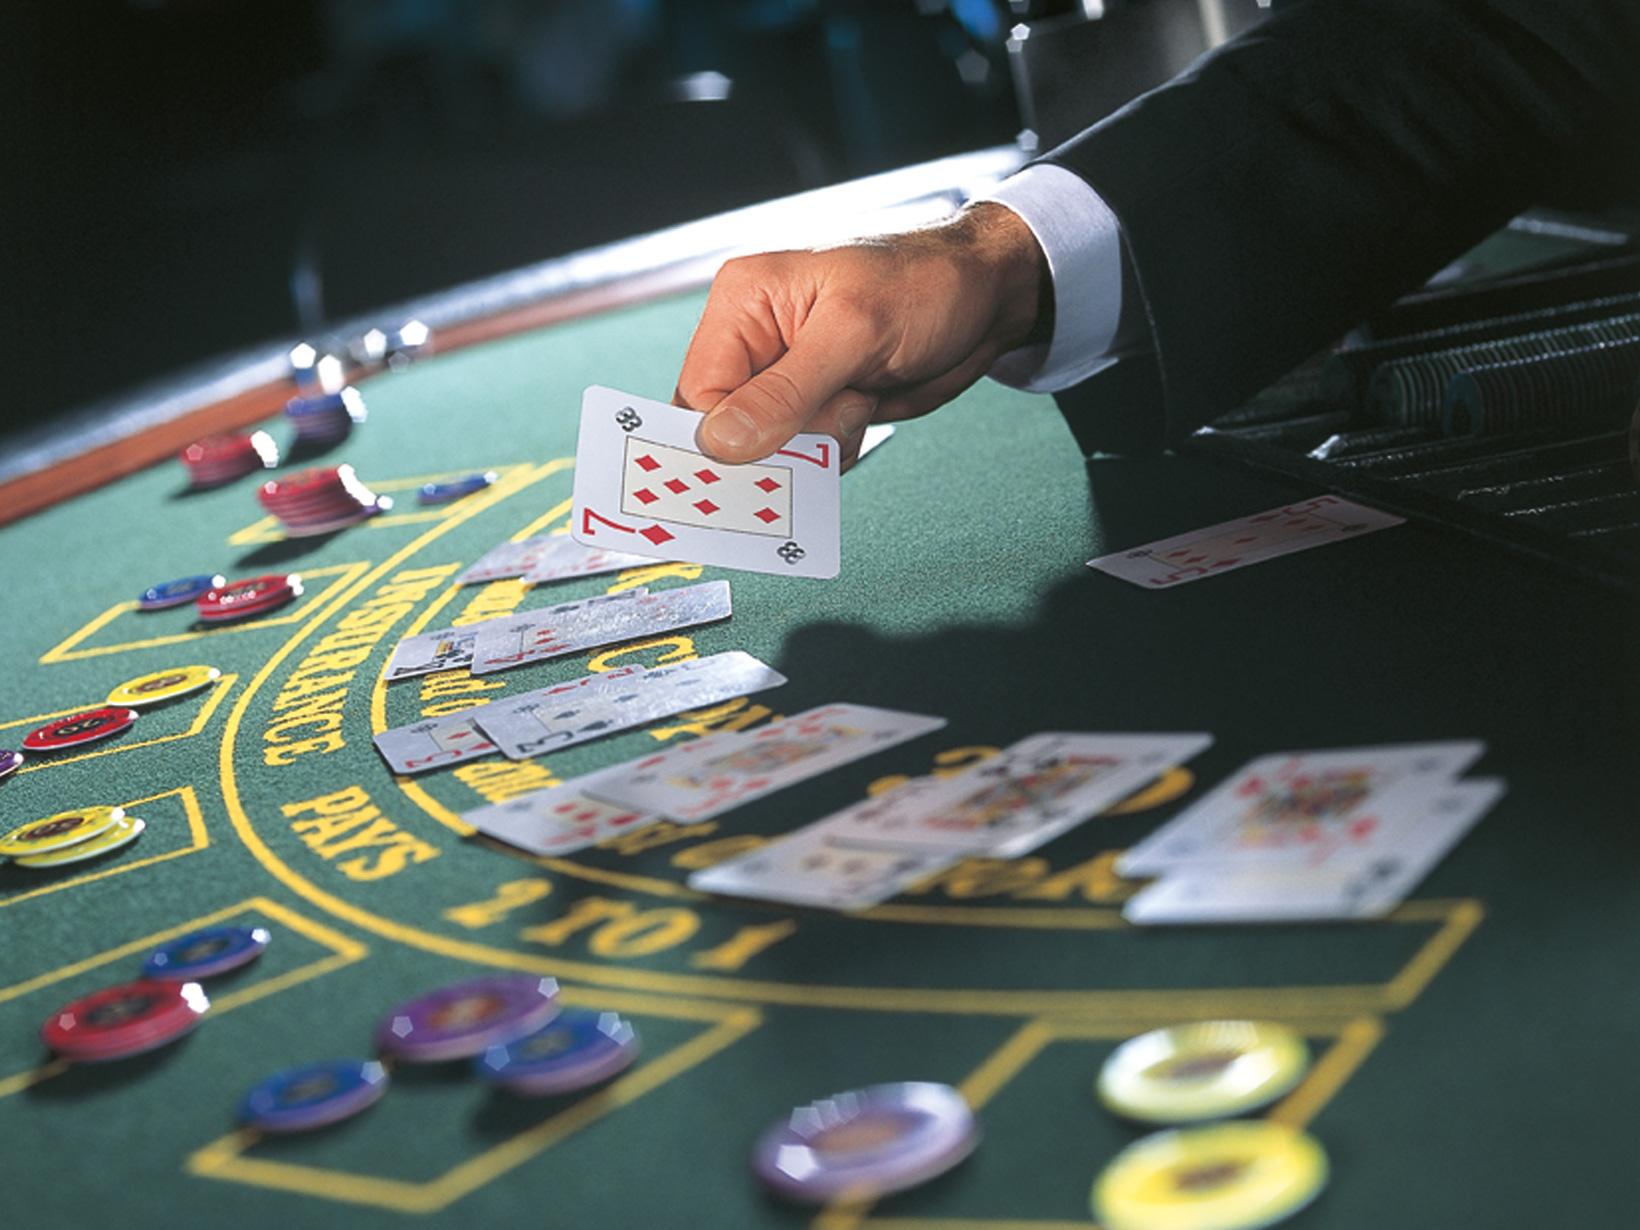 Spielbank, Arrangement, Pauschale, Jeton, Bad Steben, Casino